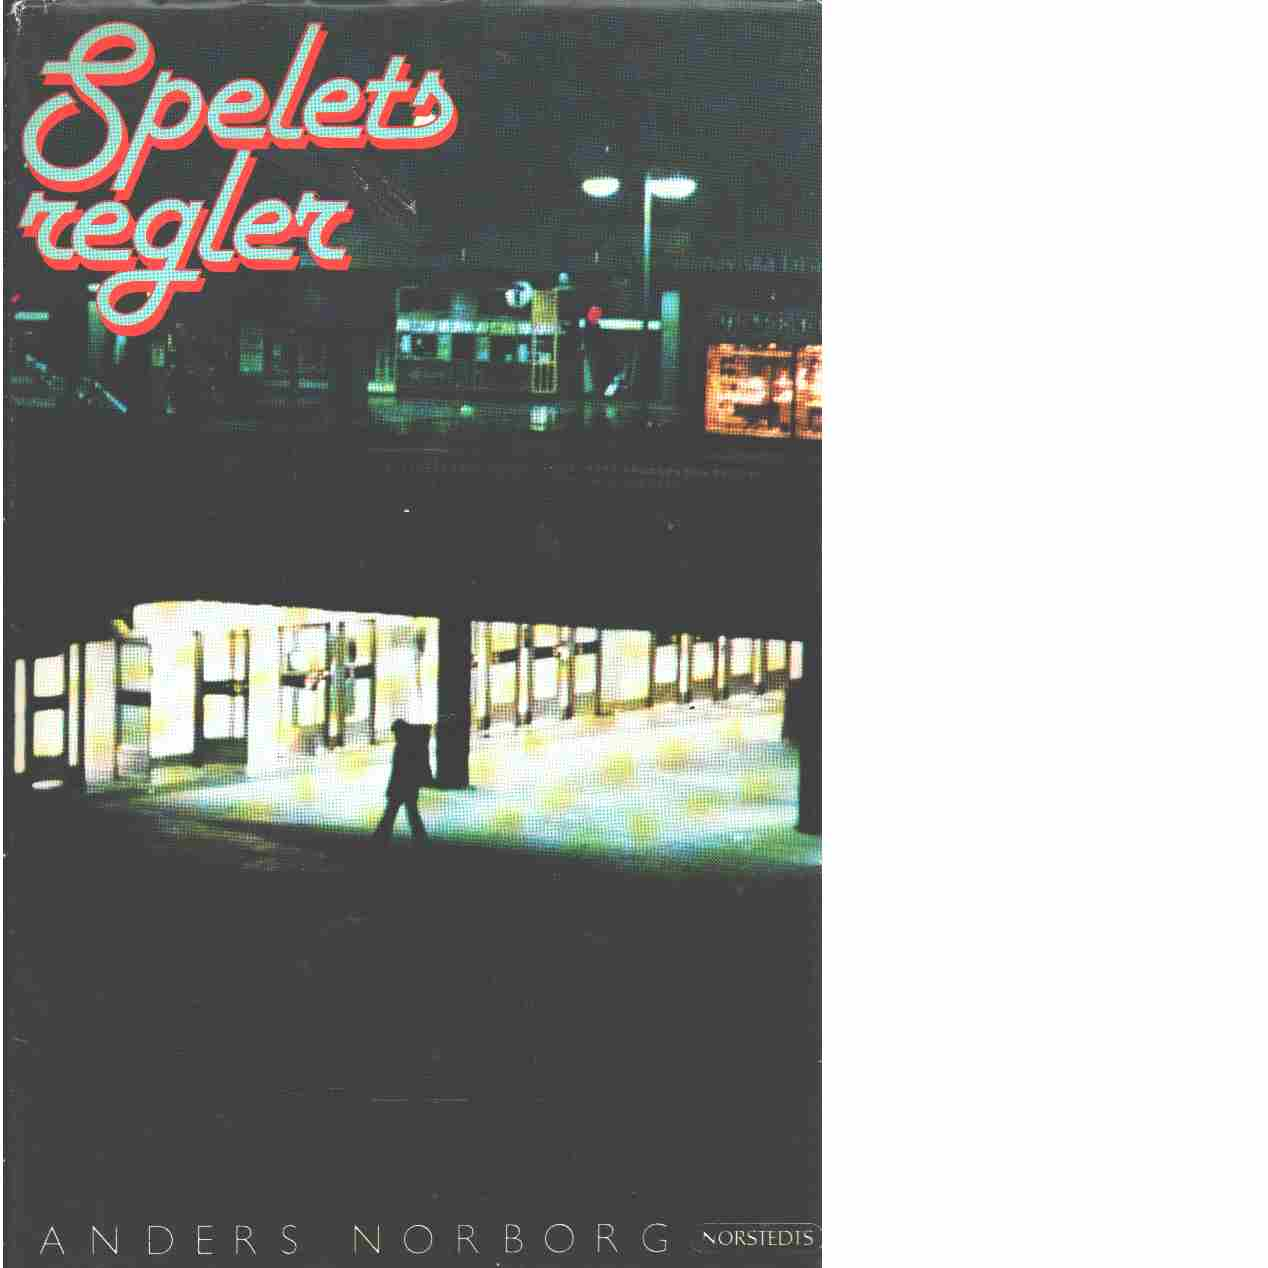 Spelets regler  - Norborg, Anders